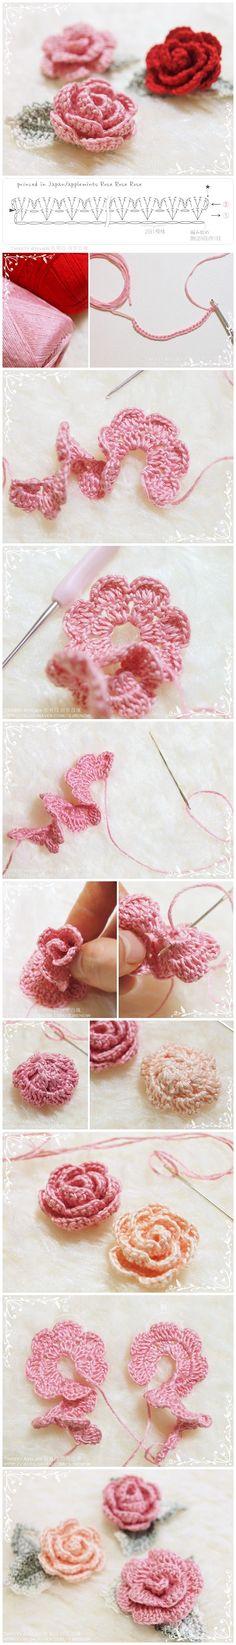 How-to-make-hand-crochet-rose